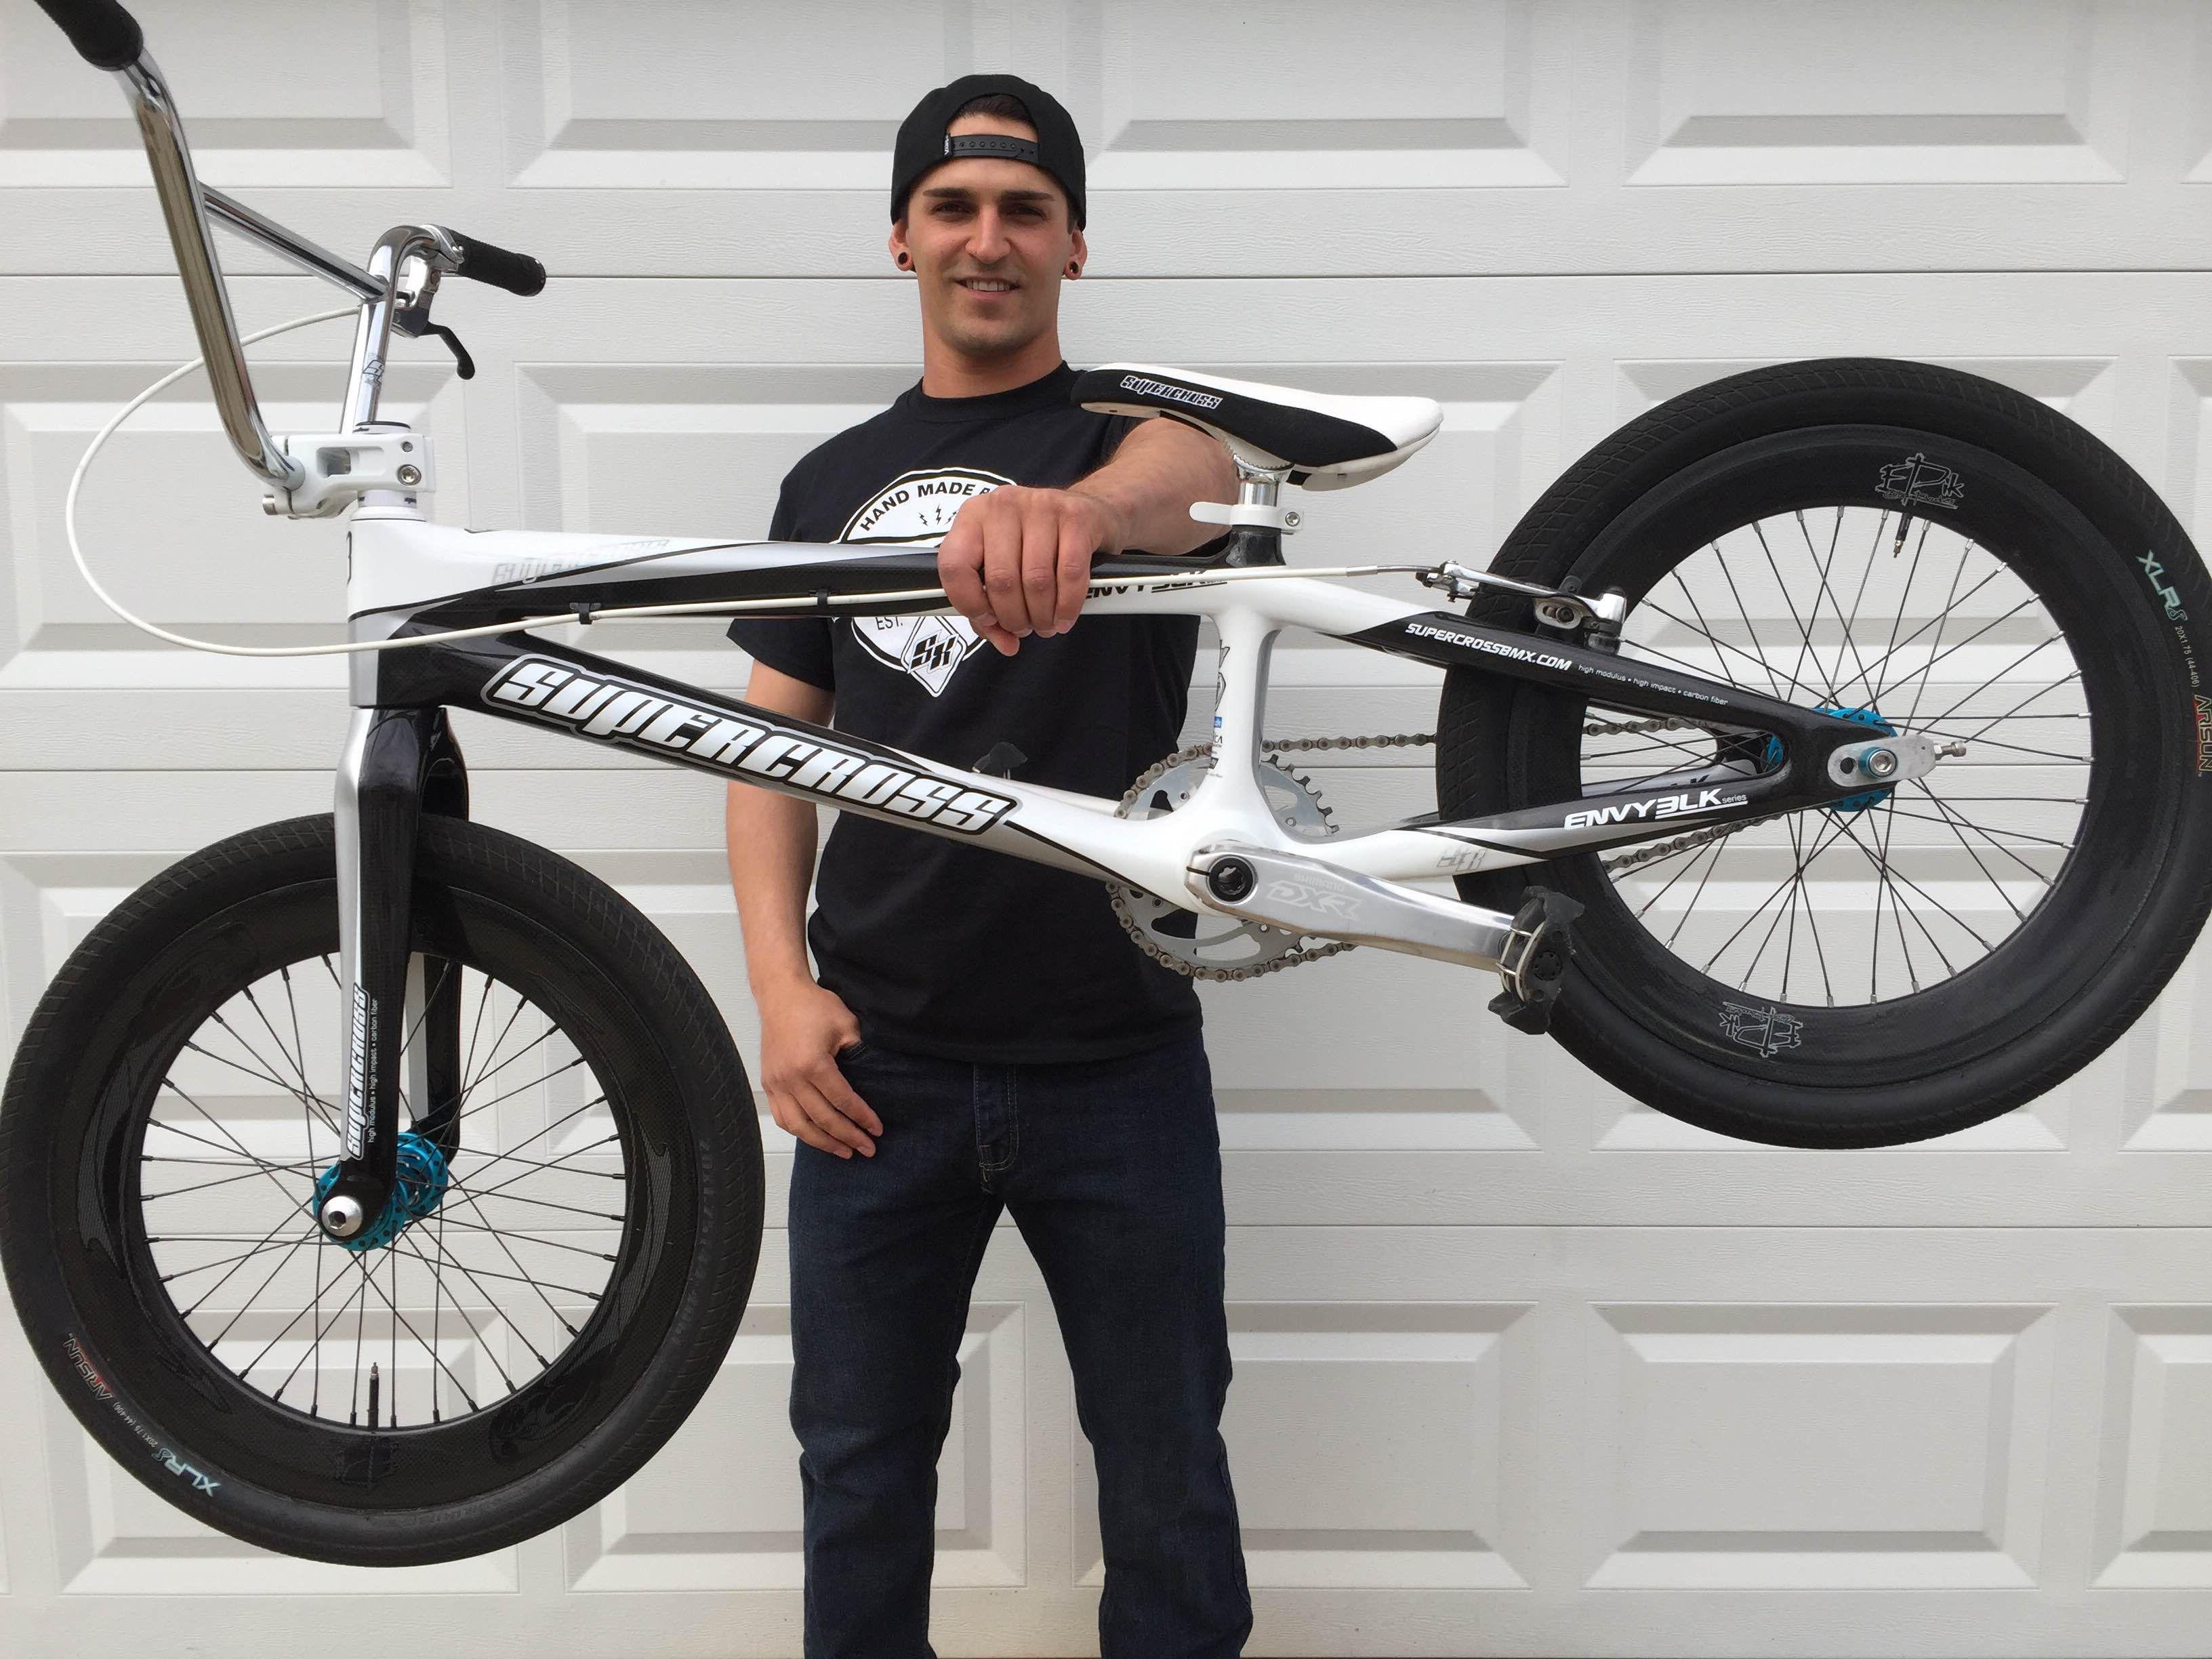 New A Pro KJ Romero and his Supercross ENVY BLK | BMX | Pinterest